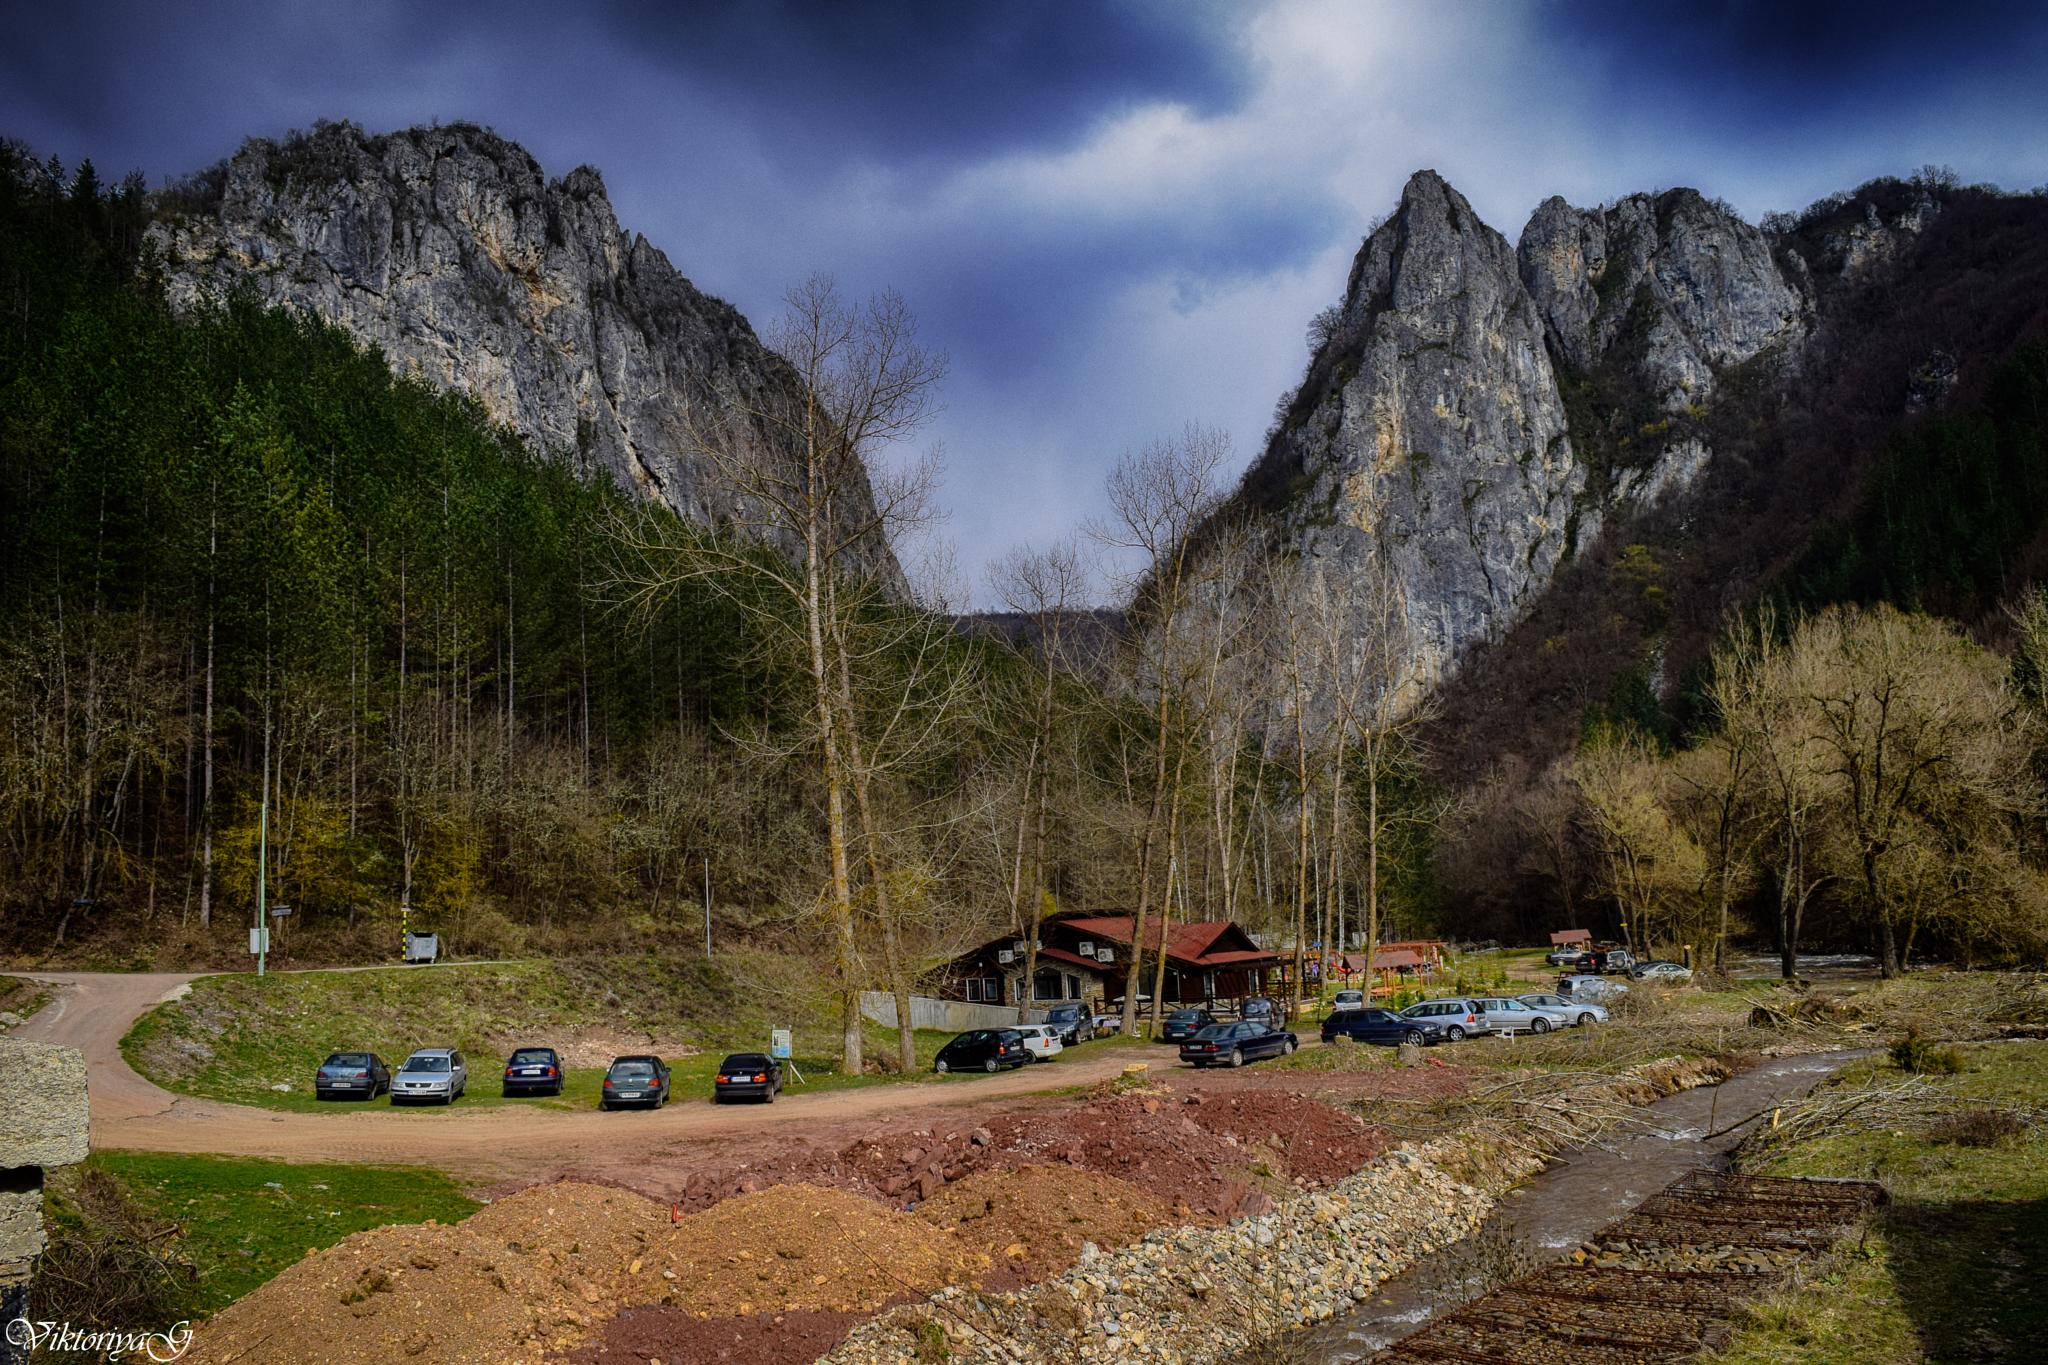 Erma River Gorge by Viktoriya Georgieva